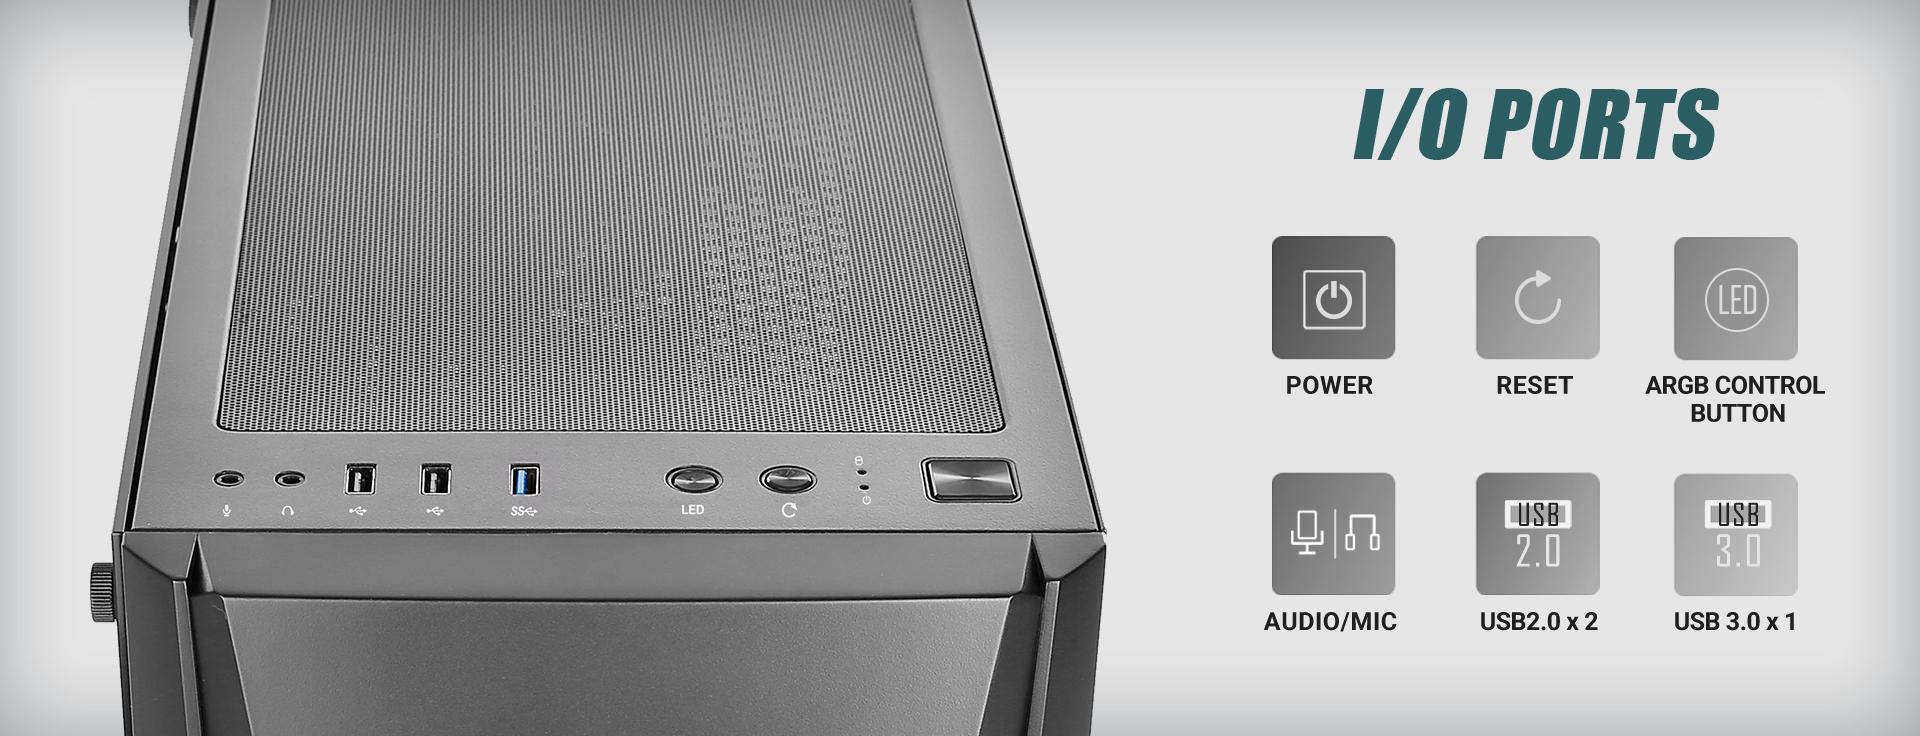 NX Series NX310 Mid Tower ATX Gaming Case I/O ports close-up and power icon, Reset icon, Argrgb control button icon, Audio/Mic icon, USB 2.0 x 2 iconUSB 3.0 x 1 icon